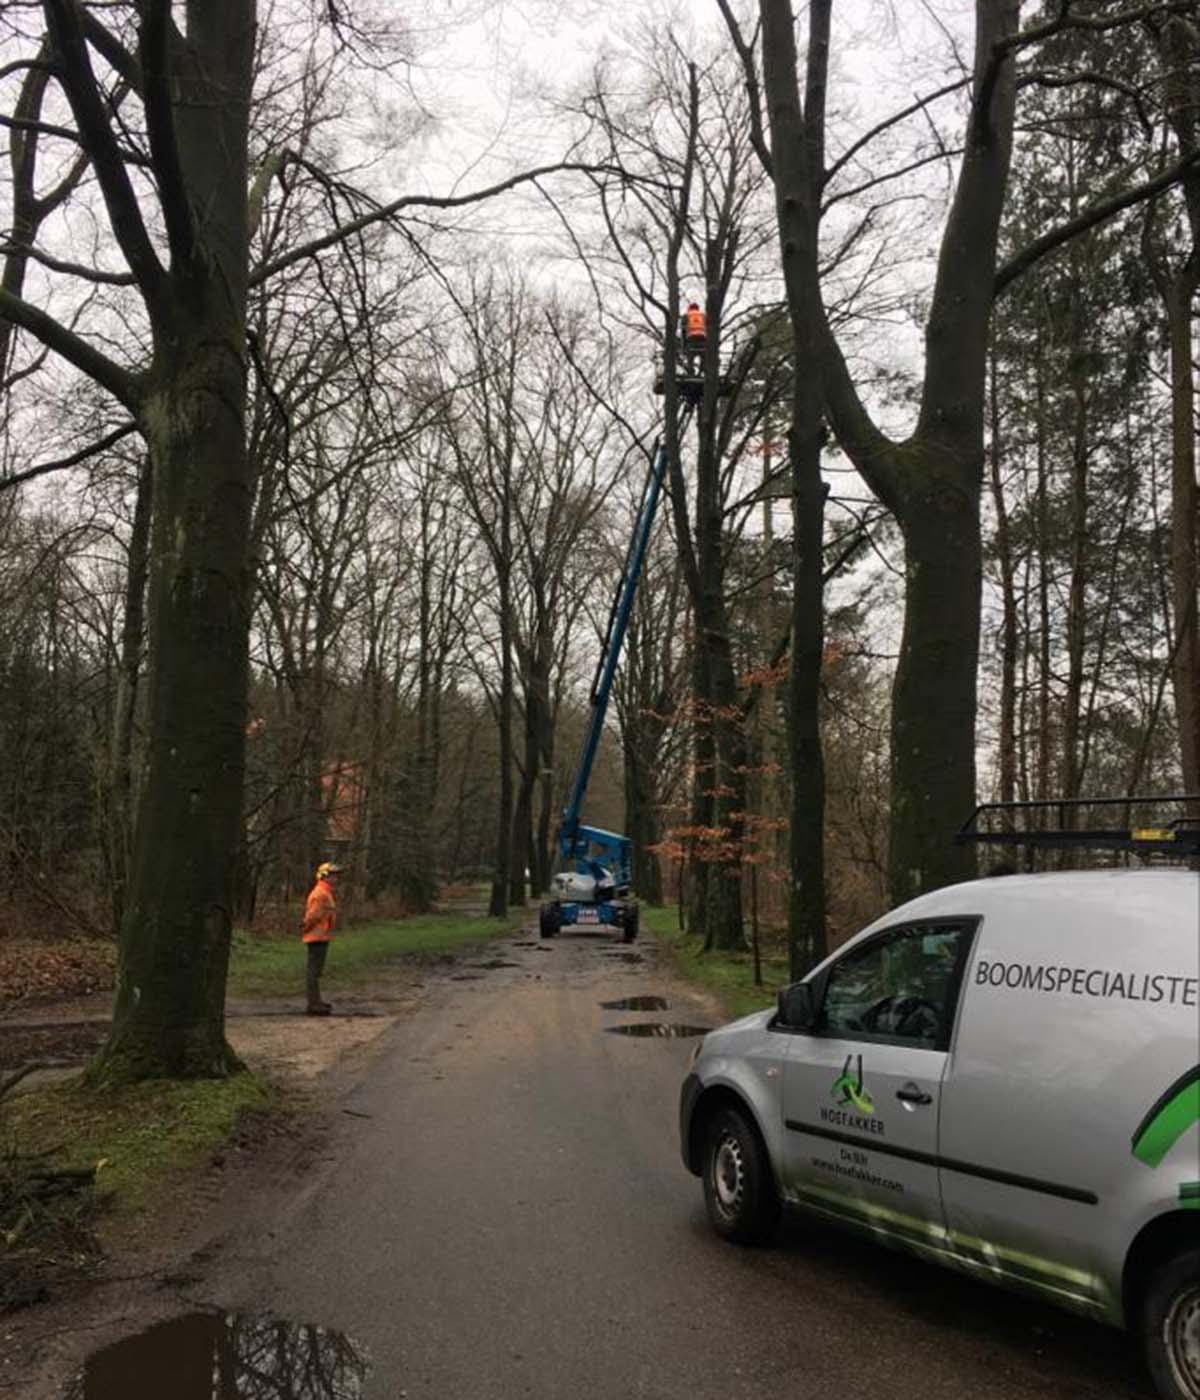 Hoefakker boomspecialisten - snoeiwerkzaamheden hoge bomen landgoed Valkenheide Maarsbergen 20-02-17 (4)